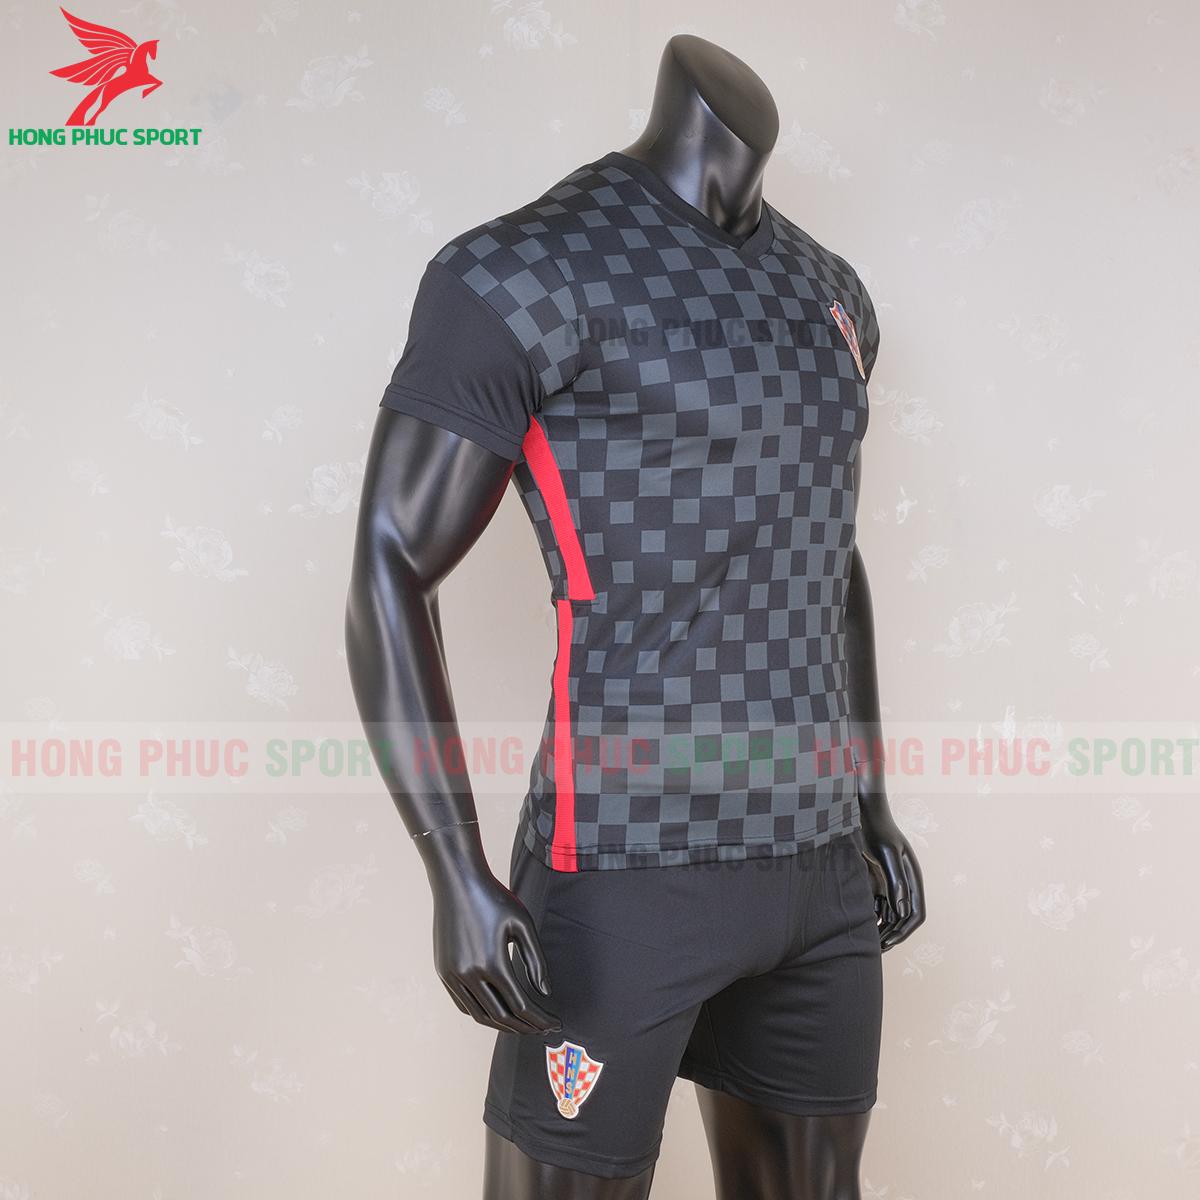 https://cdn.hongphucsport.com/unsafe/s4.shopbay.vn/files/285/ao-tuyen-croatia-2021-san-khach-1-5f71451d17de1.png